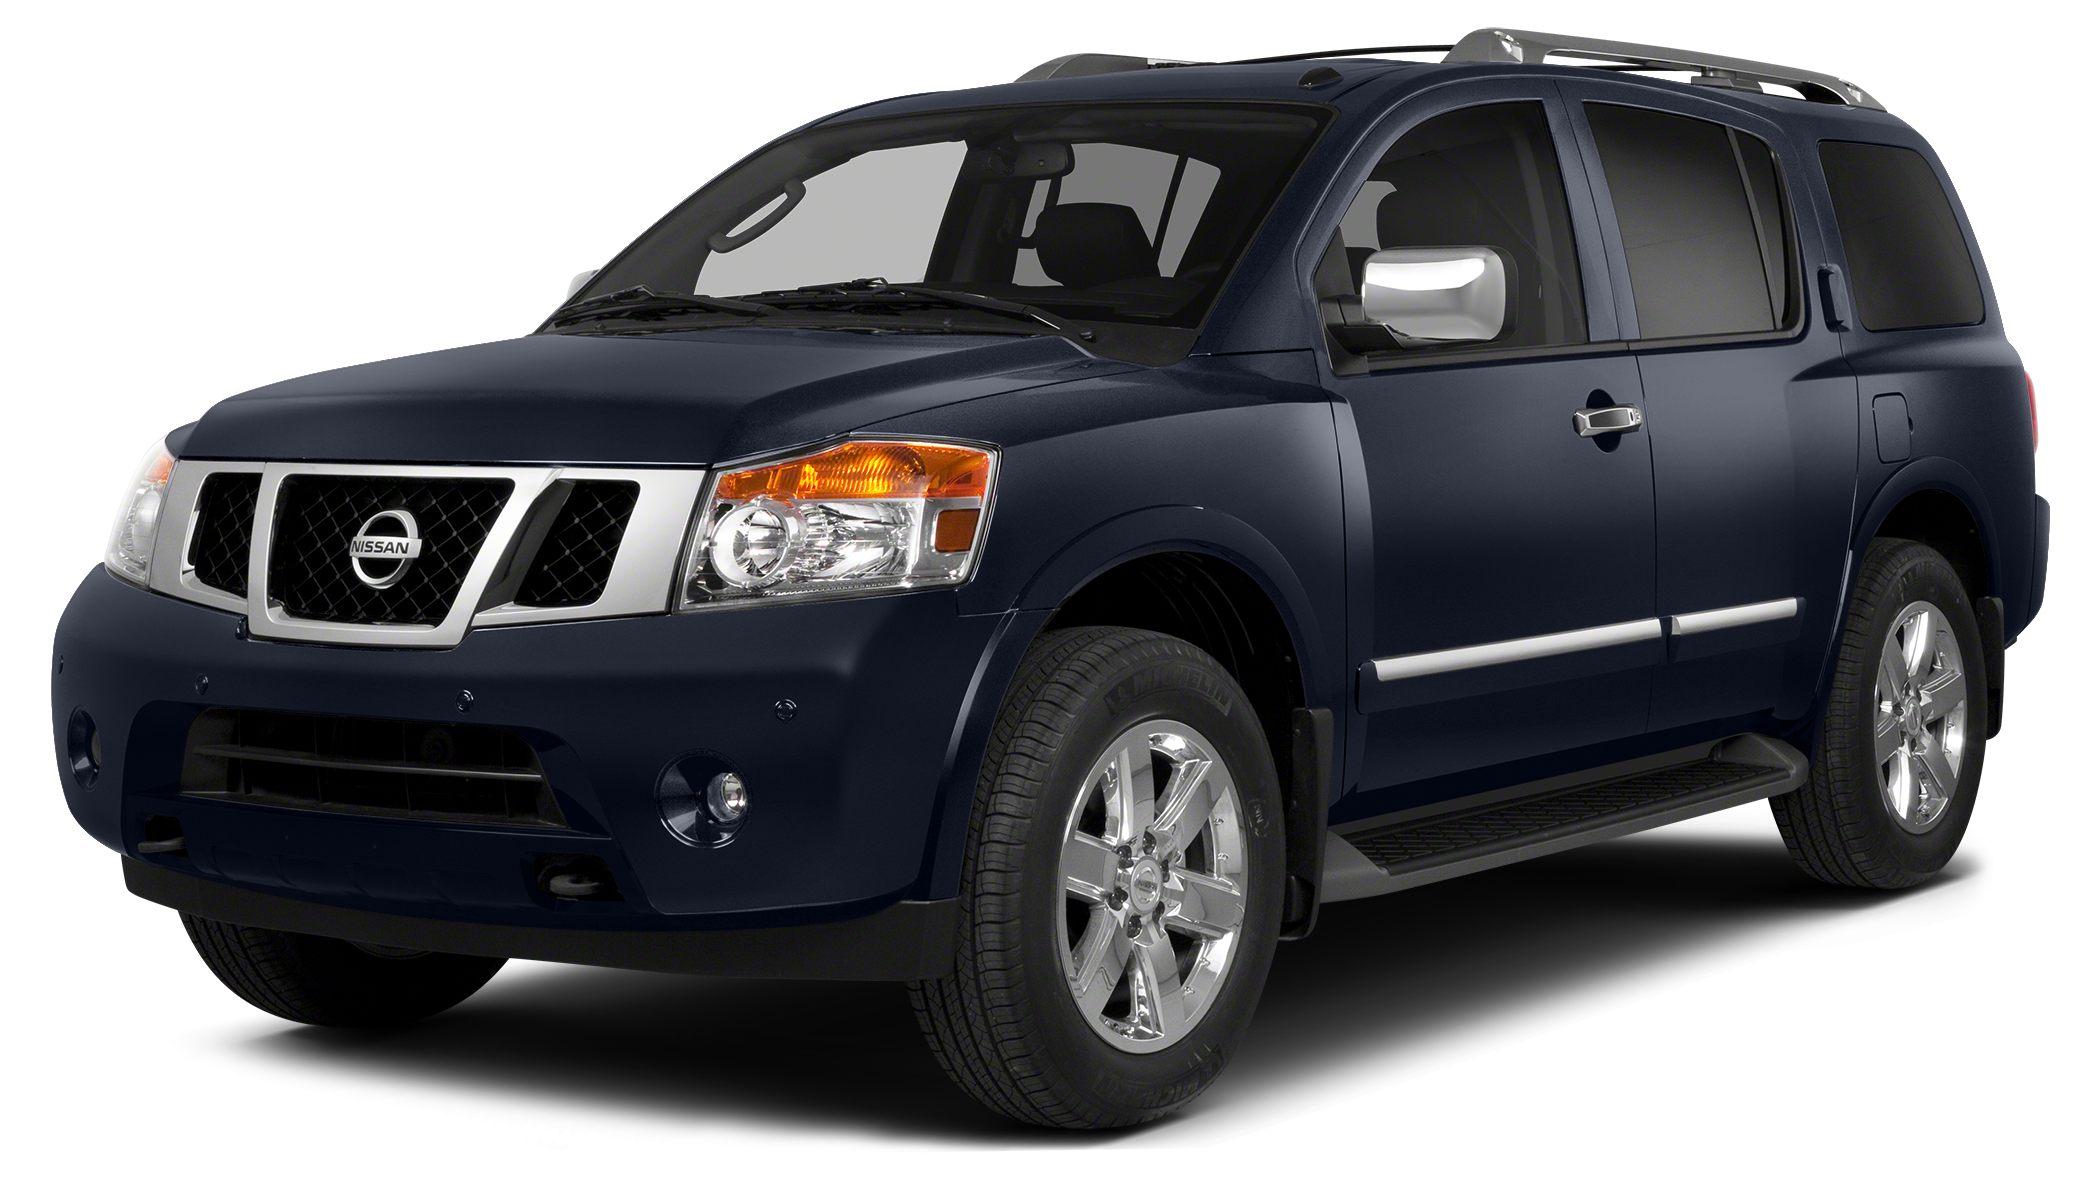 2015 Nissan Armada SL Miles 10Color Arctic Blue Metallic Stock 15AR46 VIN 5N1BA0ND6FN623261